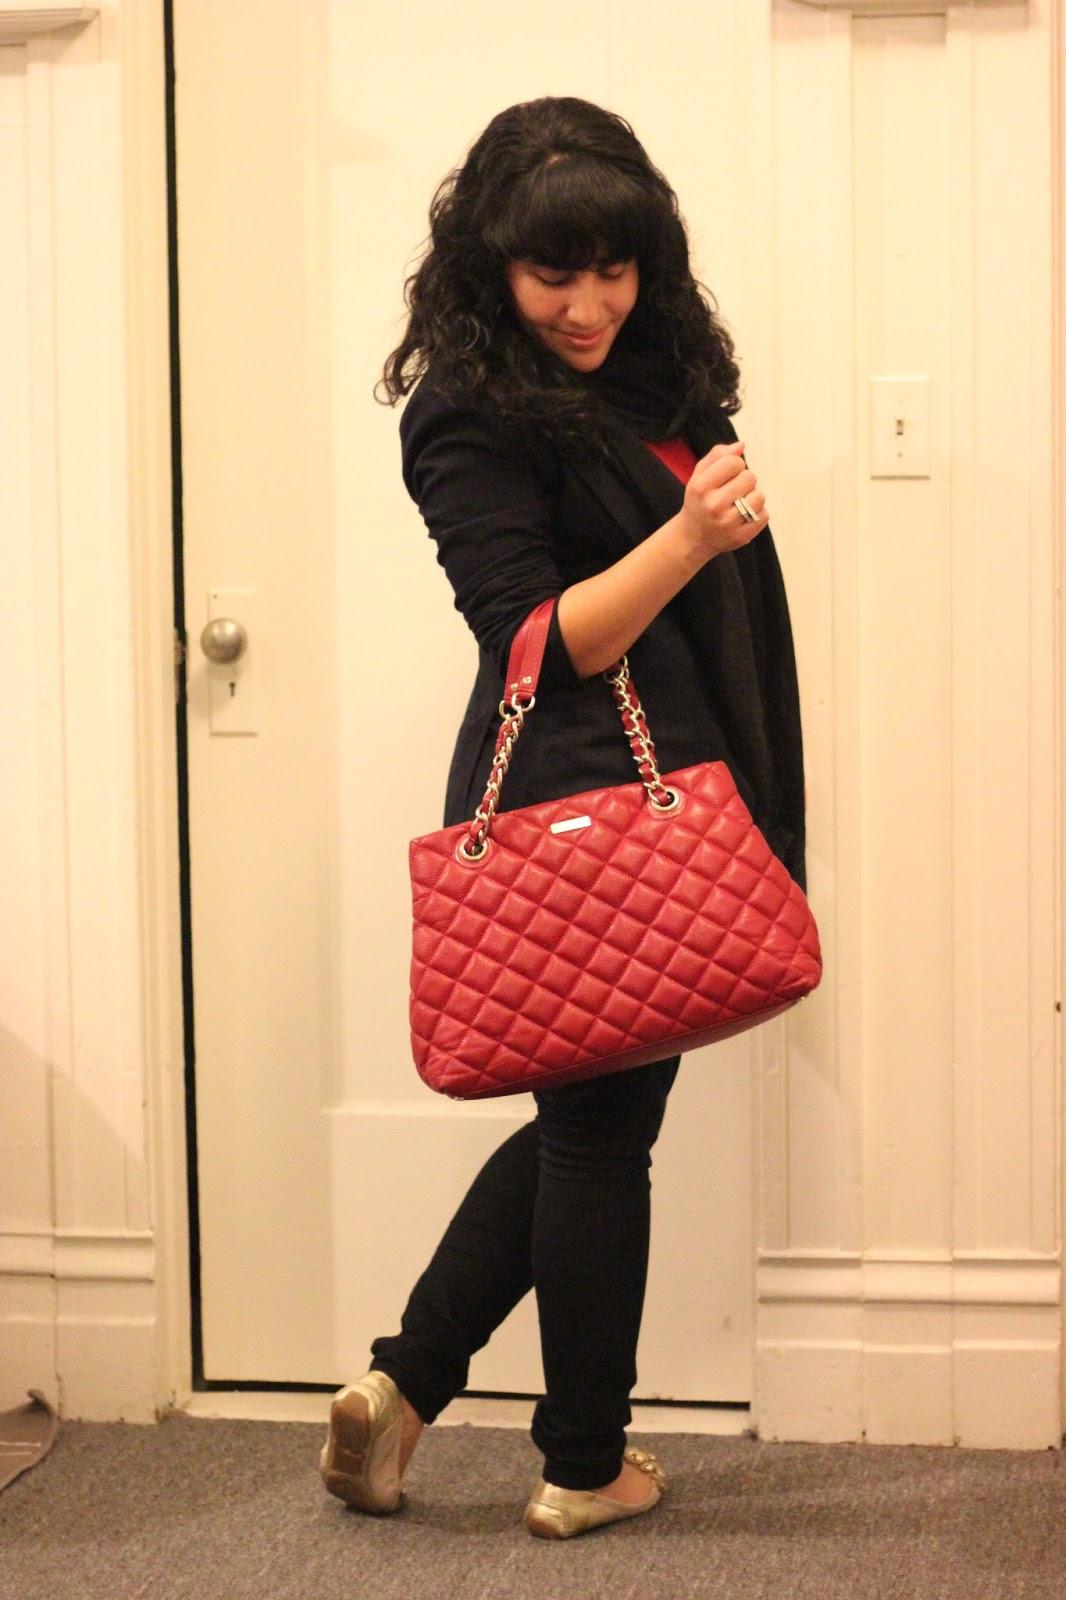 Kate Spade Purse : kate spade red quilted bag - Adamdwight.com